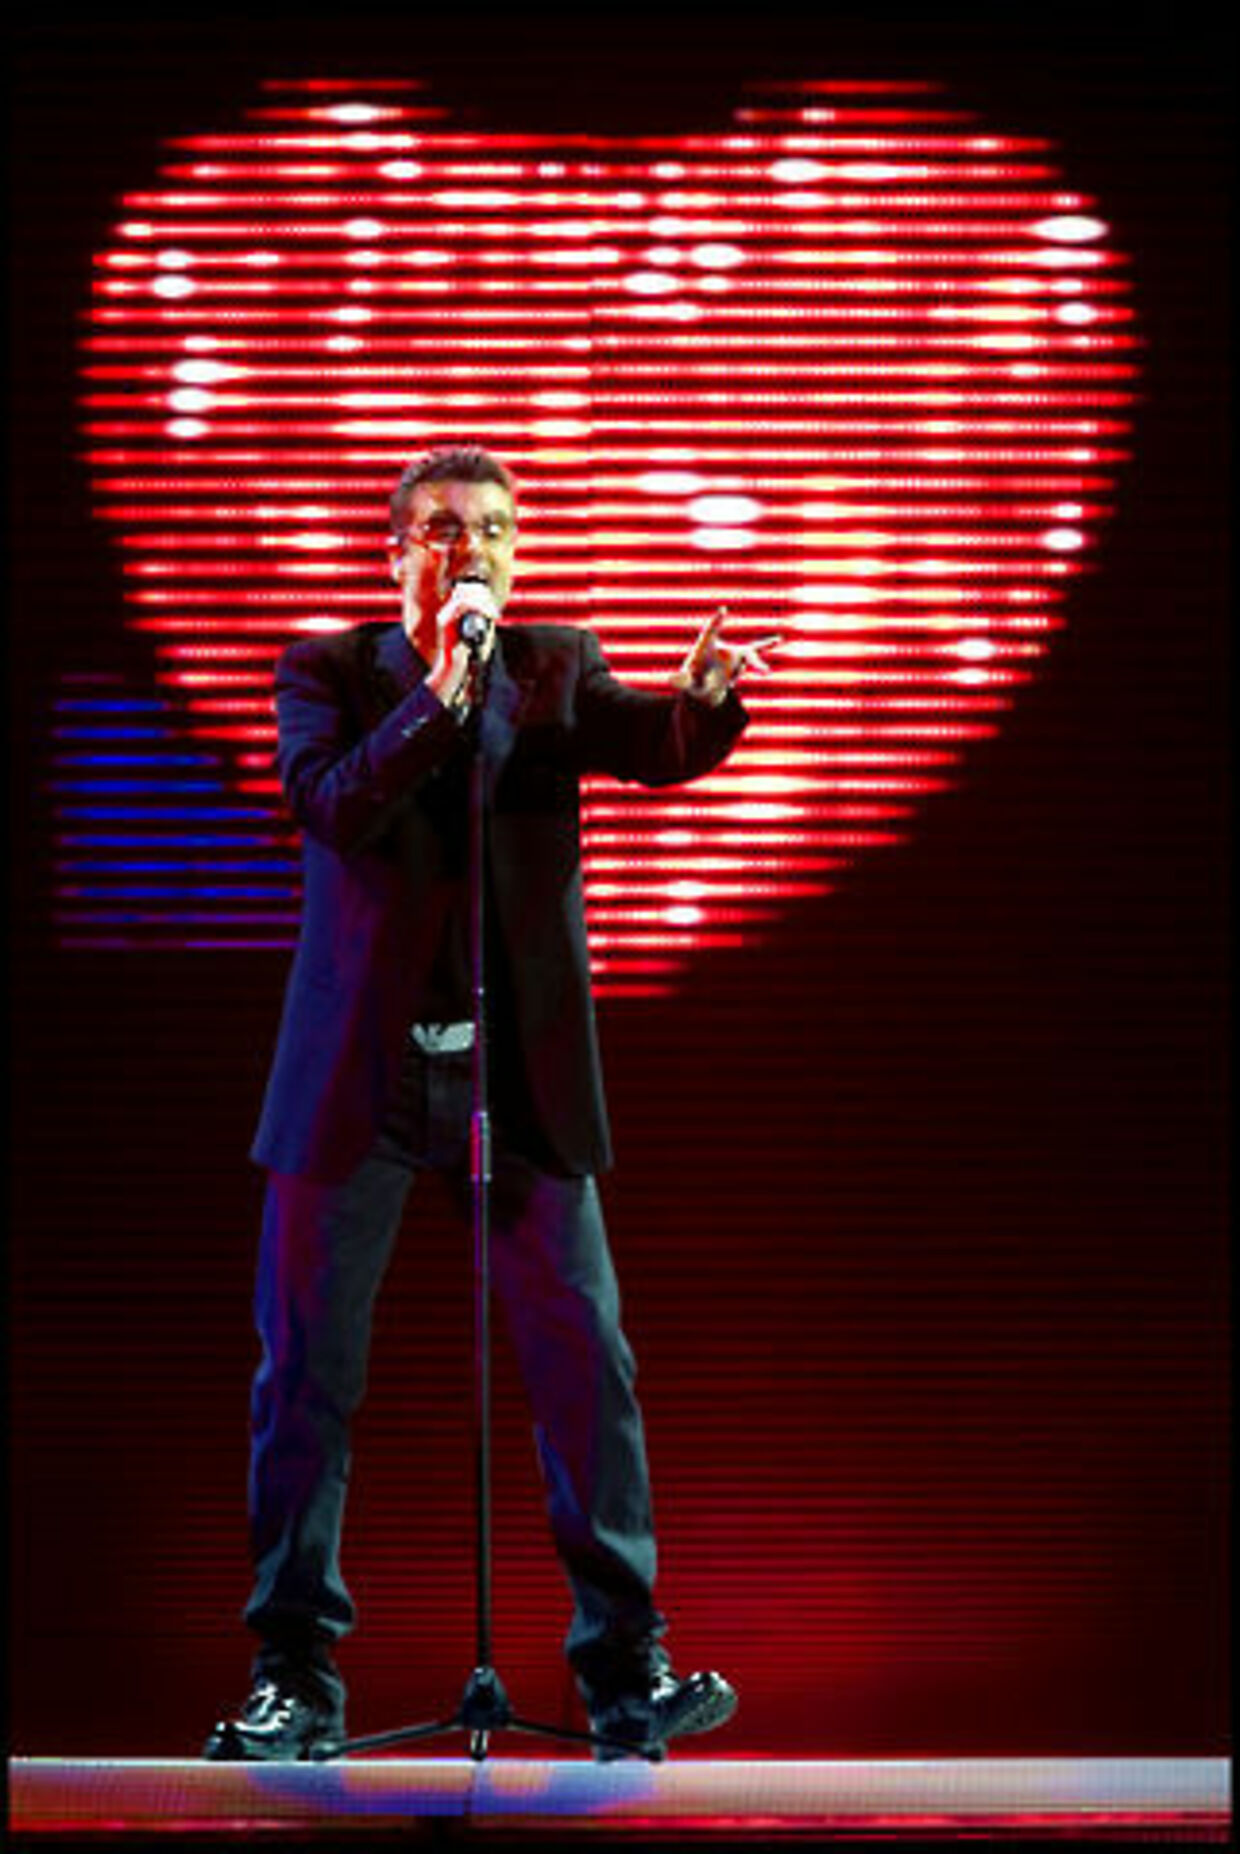 Popikonet synger til hjertet... Foto: Nils Mailvang.